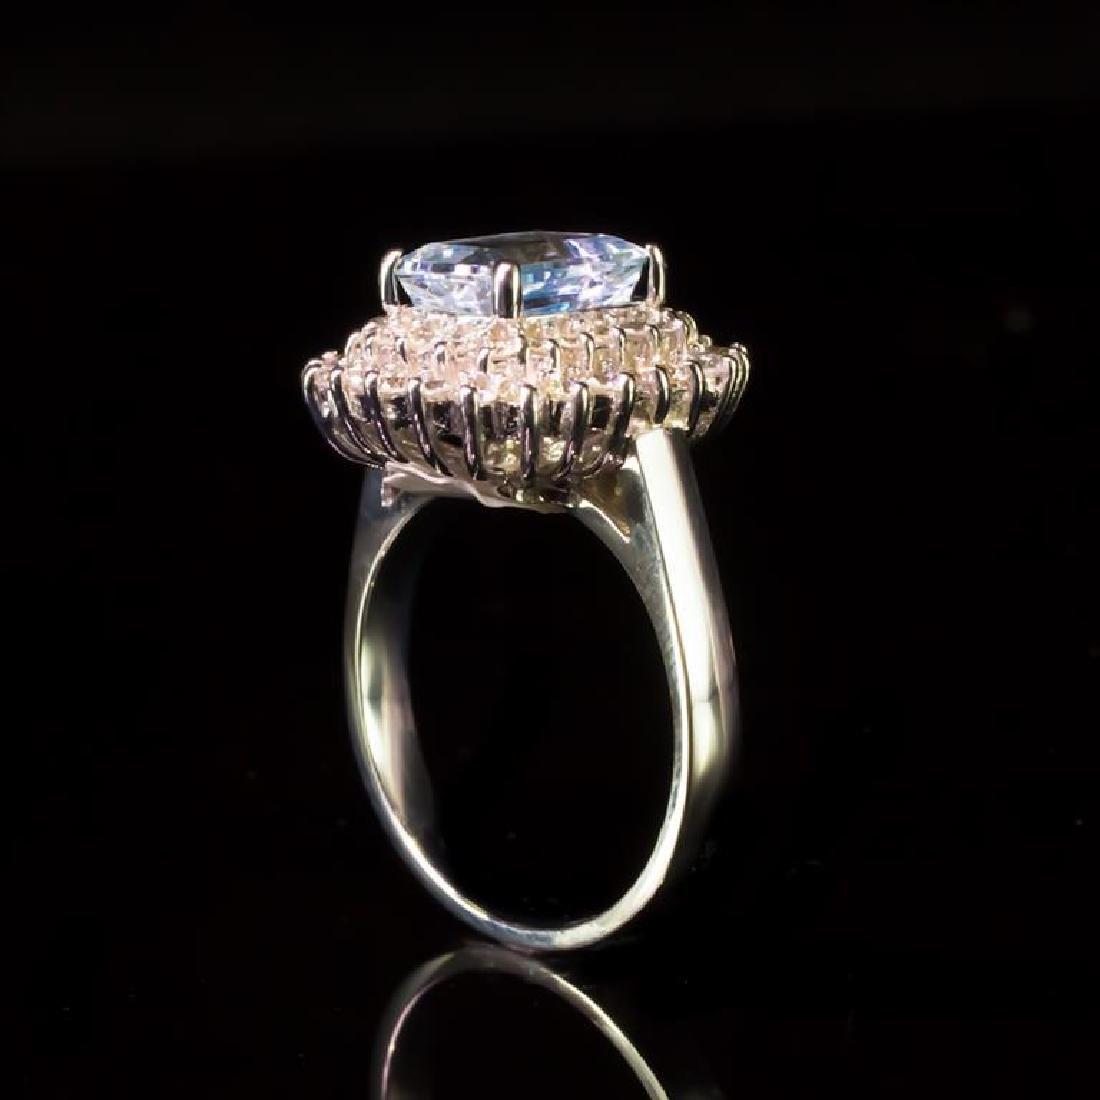 14k Gold 2.06ct Aquamarine 1.11ct Diamond Ring - 3